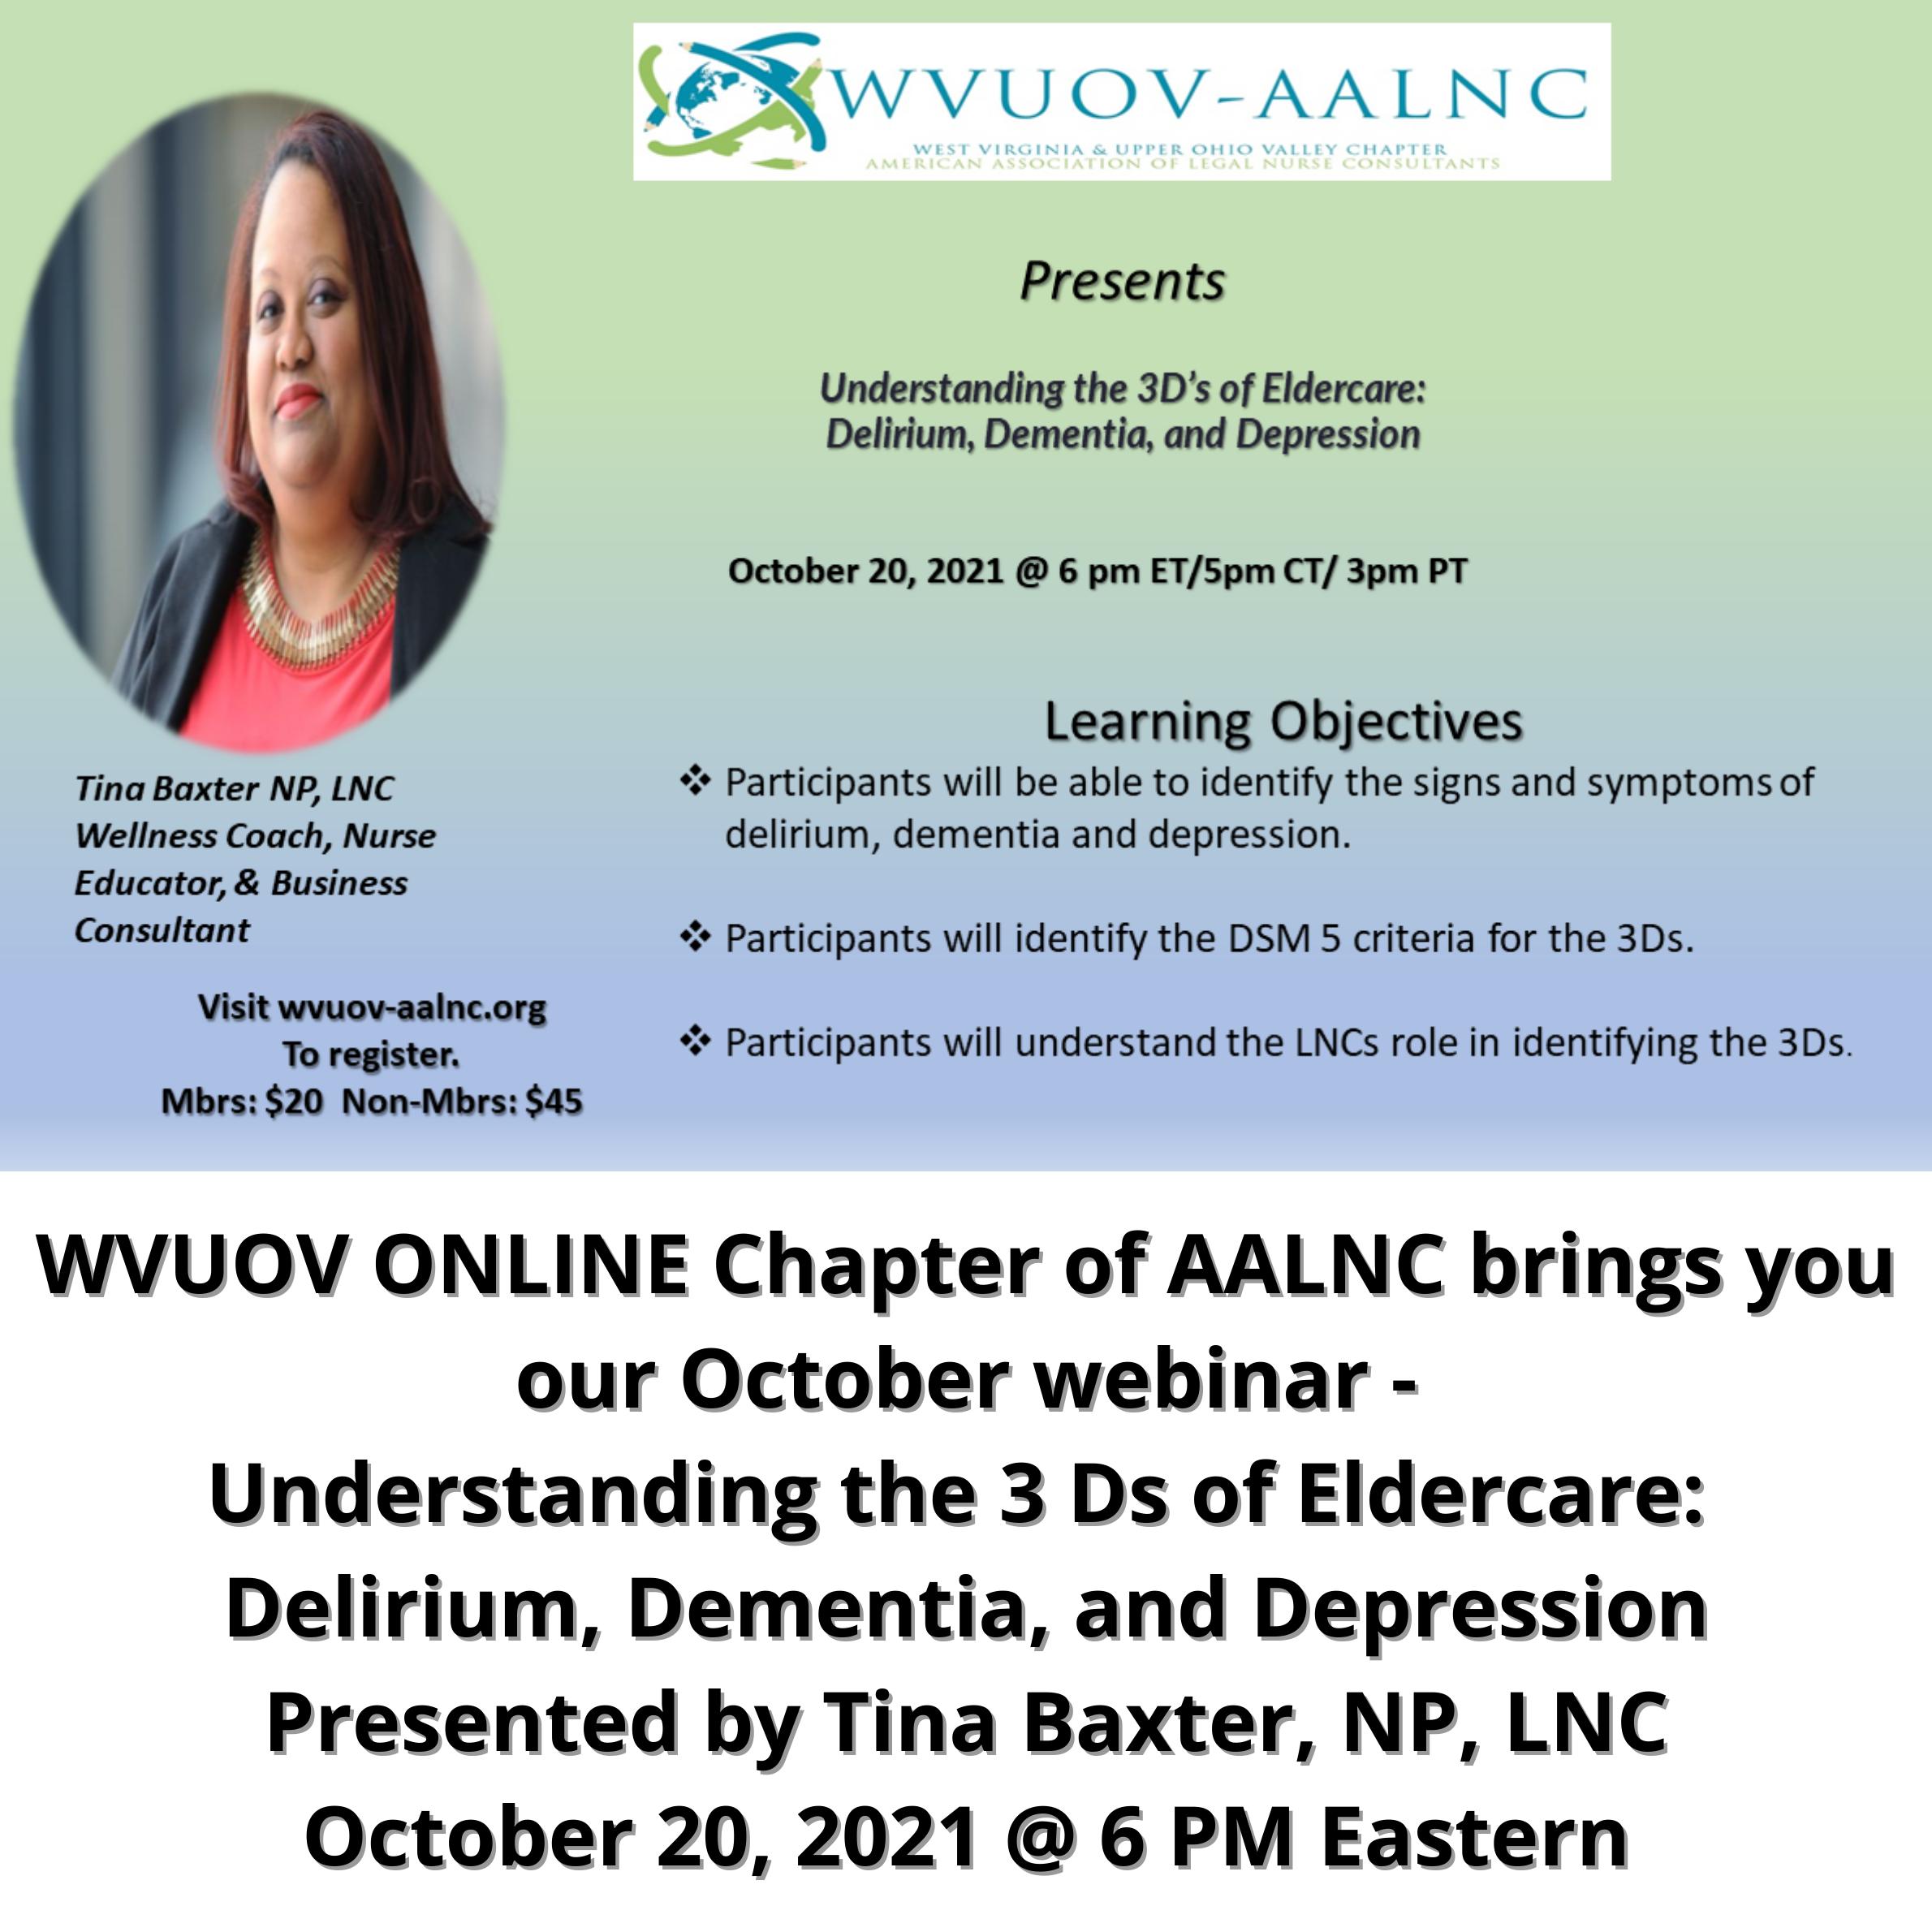 Tina-Baxter-WVUOV-webinar-Oct-2021